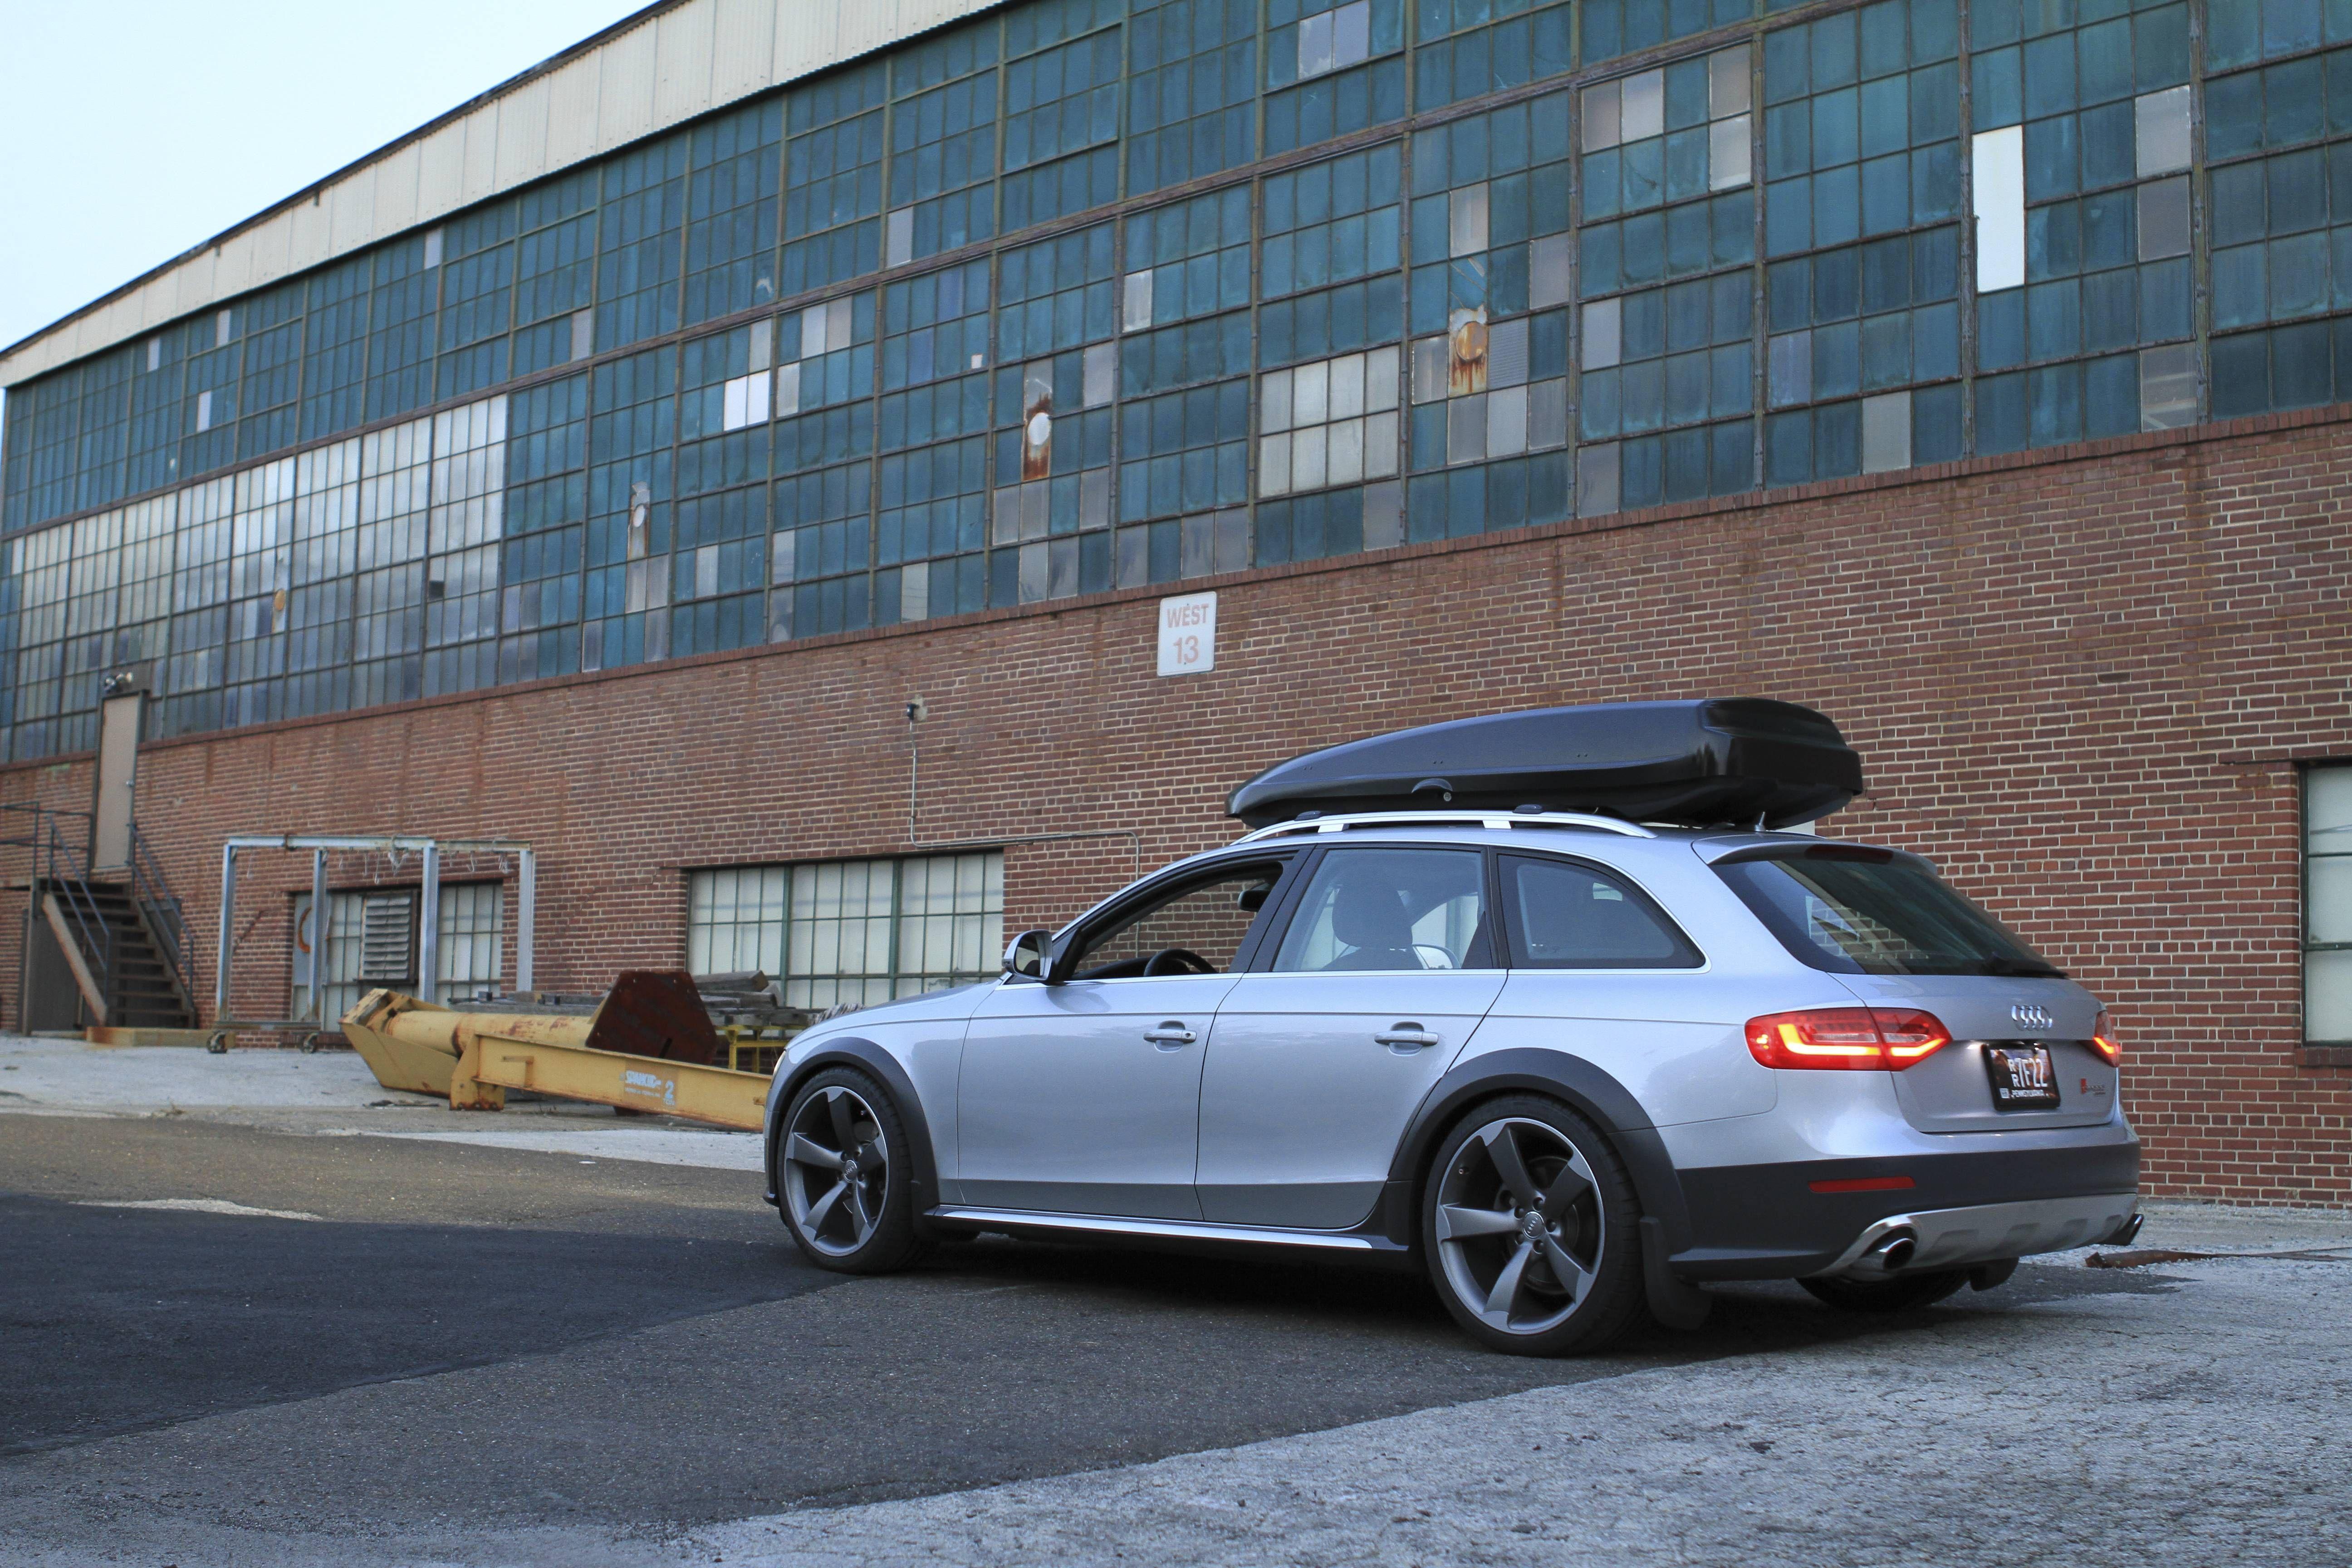 Audizine Forums Audi Allroad Pinterest Audi Allroad Cars And - Audi forums